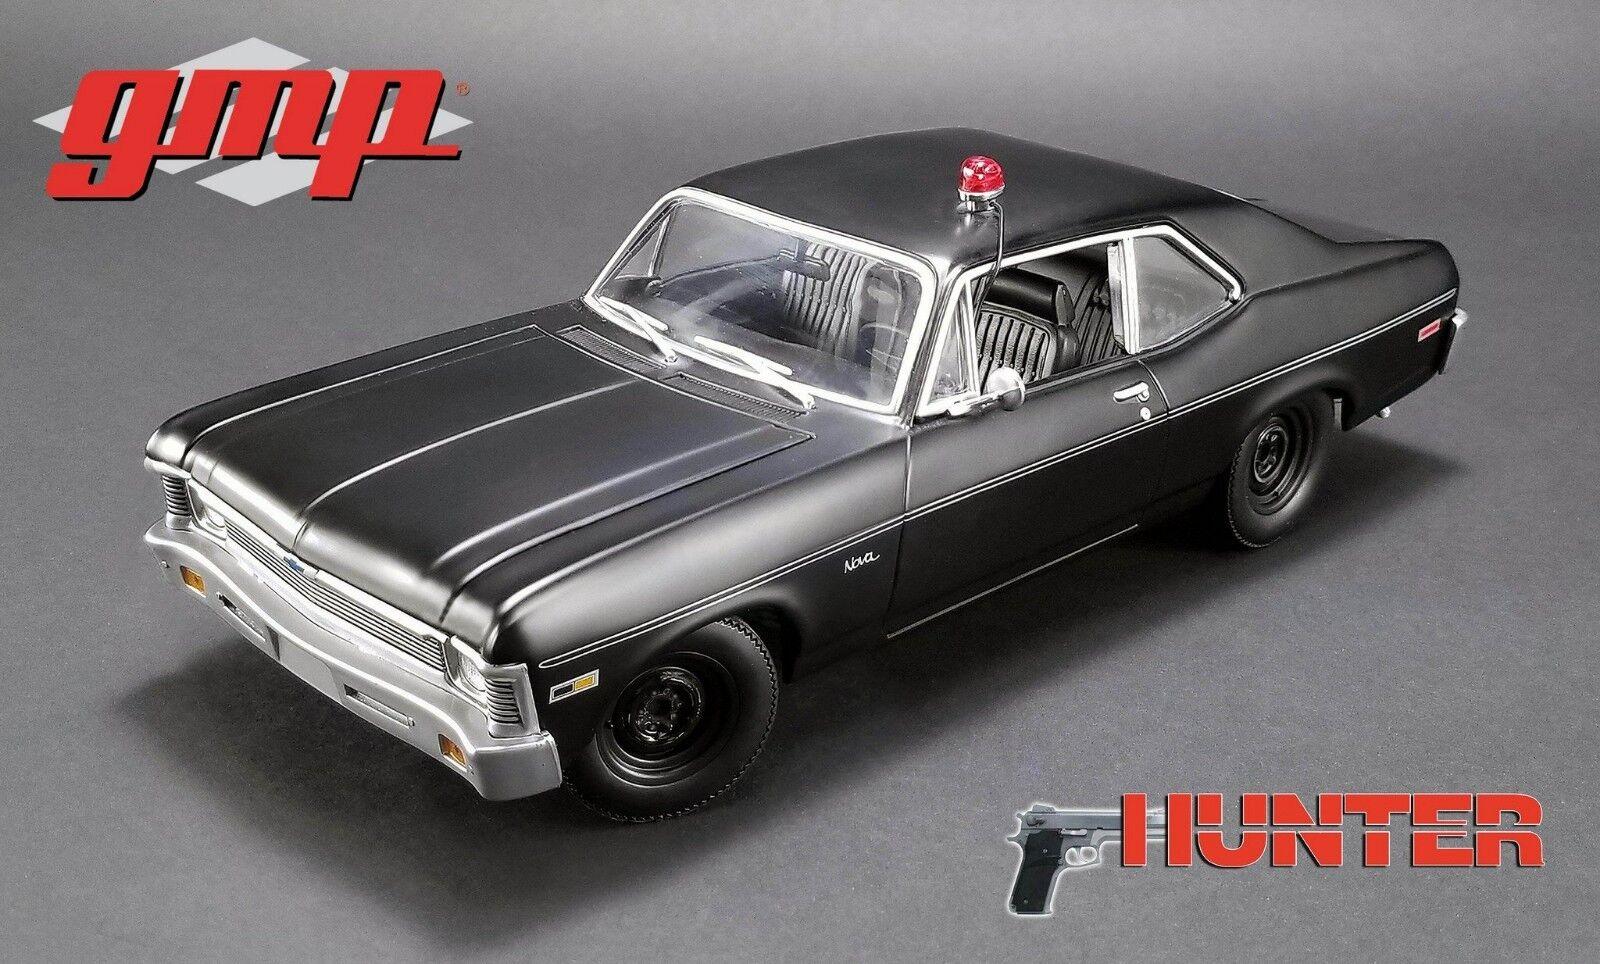 GMP 1 18 Hunter (1984-91 (1984-91 (1984-91 TV Series) - 1971 Chevrolet Nova Police GMP-18903 1ba3ff